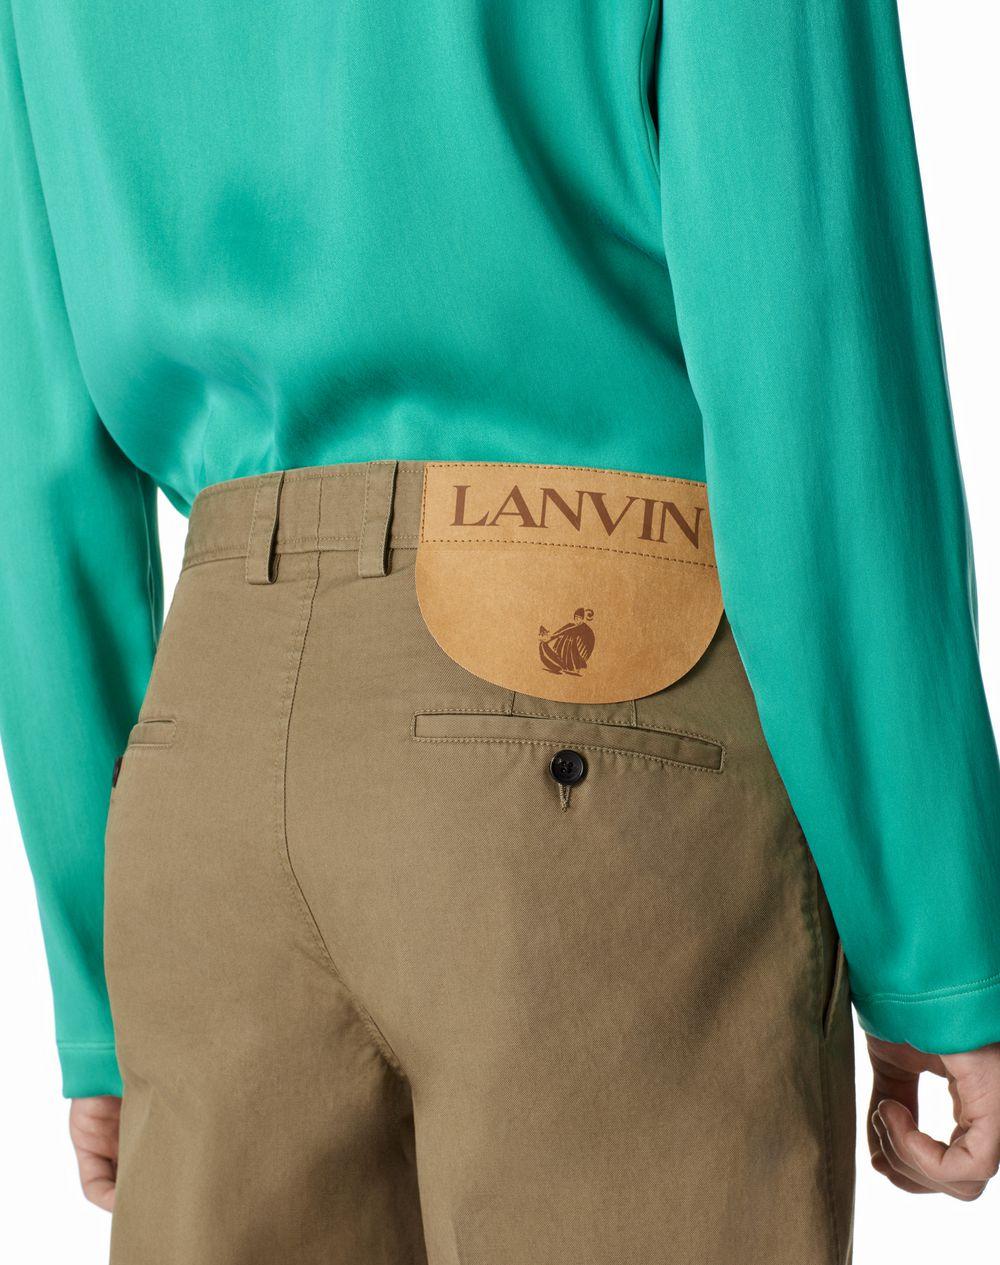 CHINO TROUSERS - Lanvin